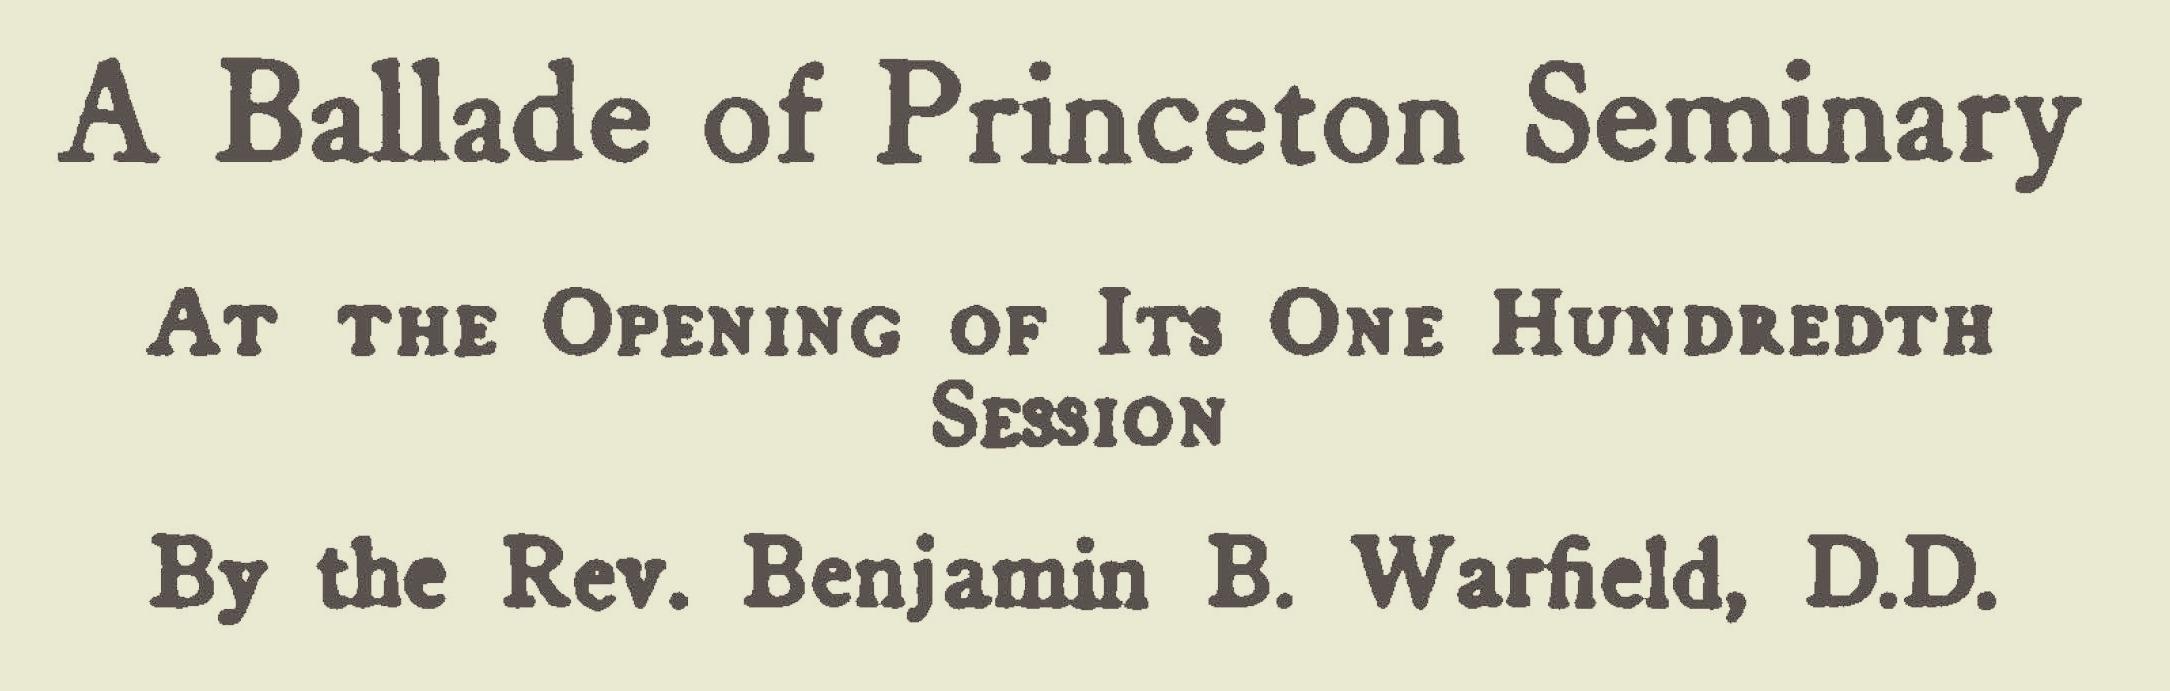 Warfield, Benjamin Breckinridge, A Ballade of Princeton Seminary Title Page.jpg